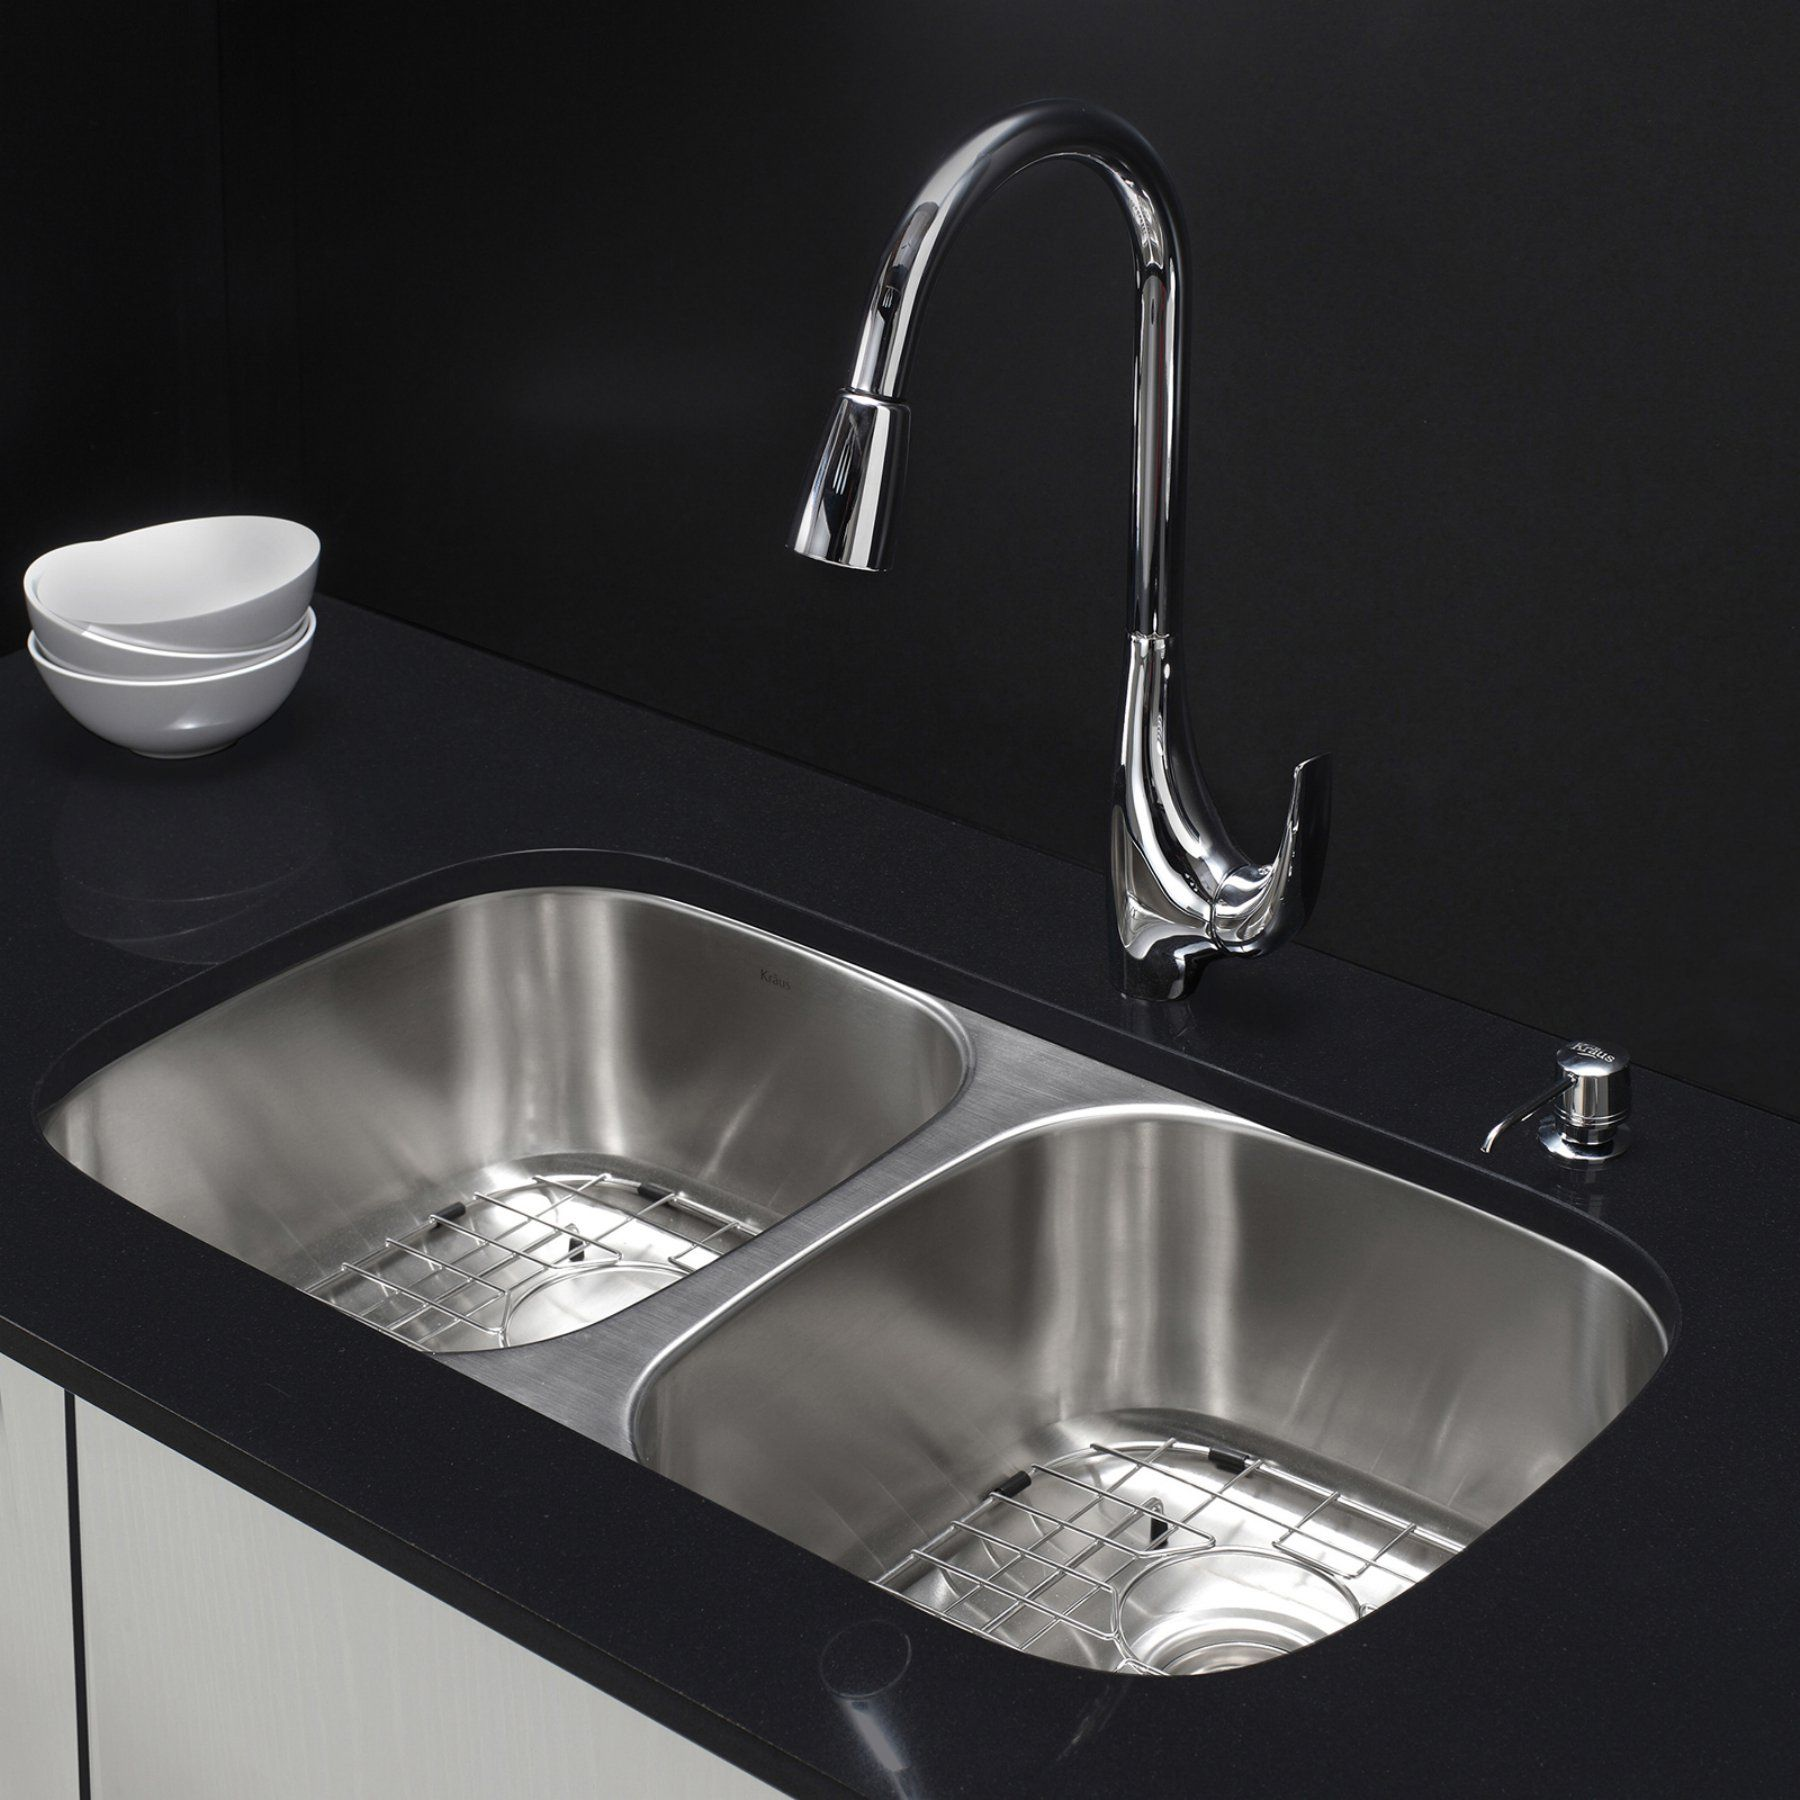 kraus kbu22 kpf1621 ksd30ch double basin undermount kitchen sink rh pinterest ch